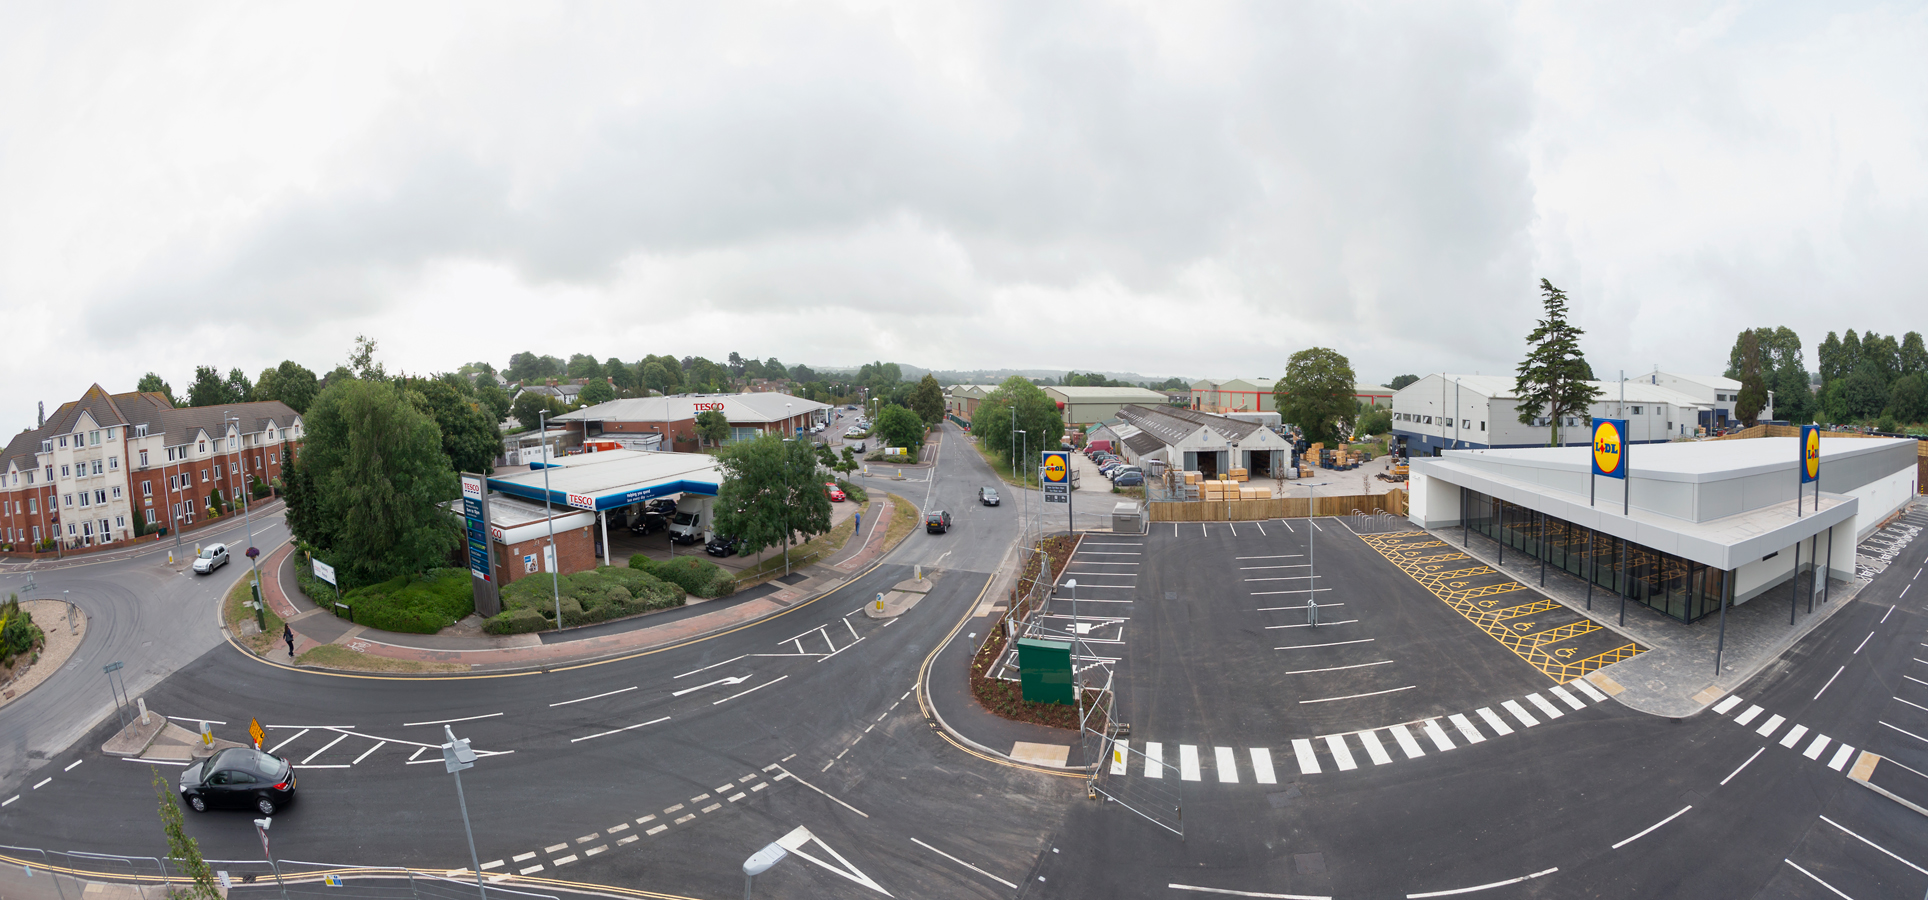 Lidl food store, Chard, Jessops Construction Ltd